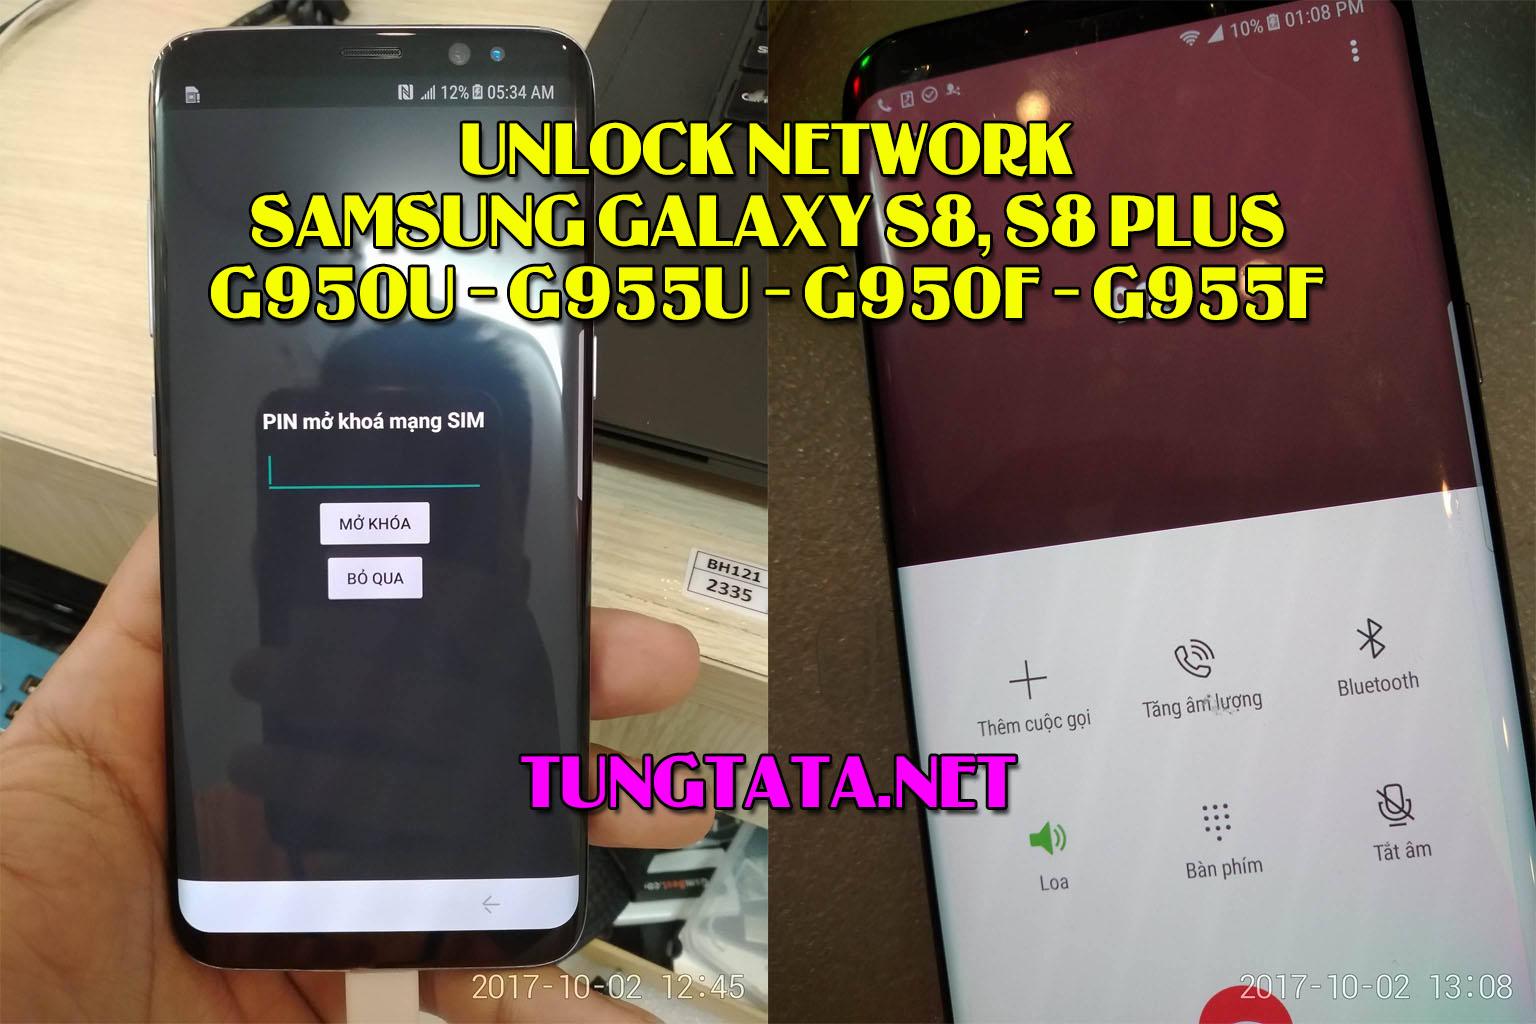 Unlock Samsung Galaxy S8, S8 Plus G950F G955F G950U G955U